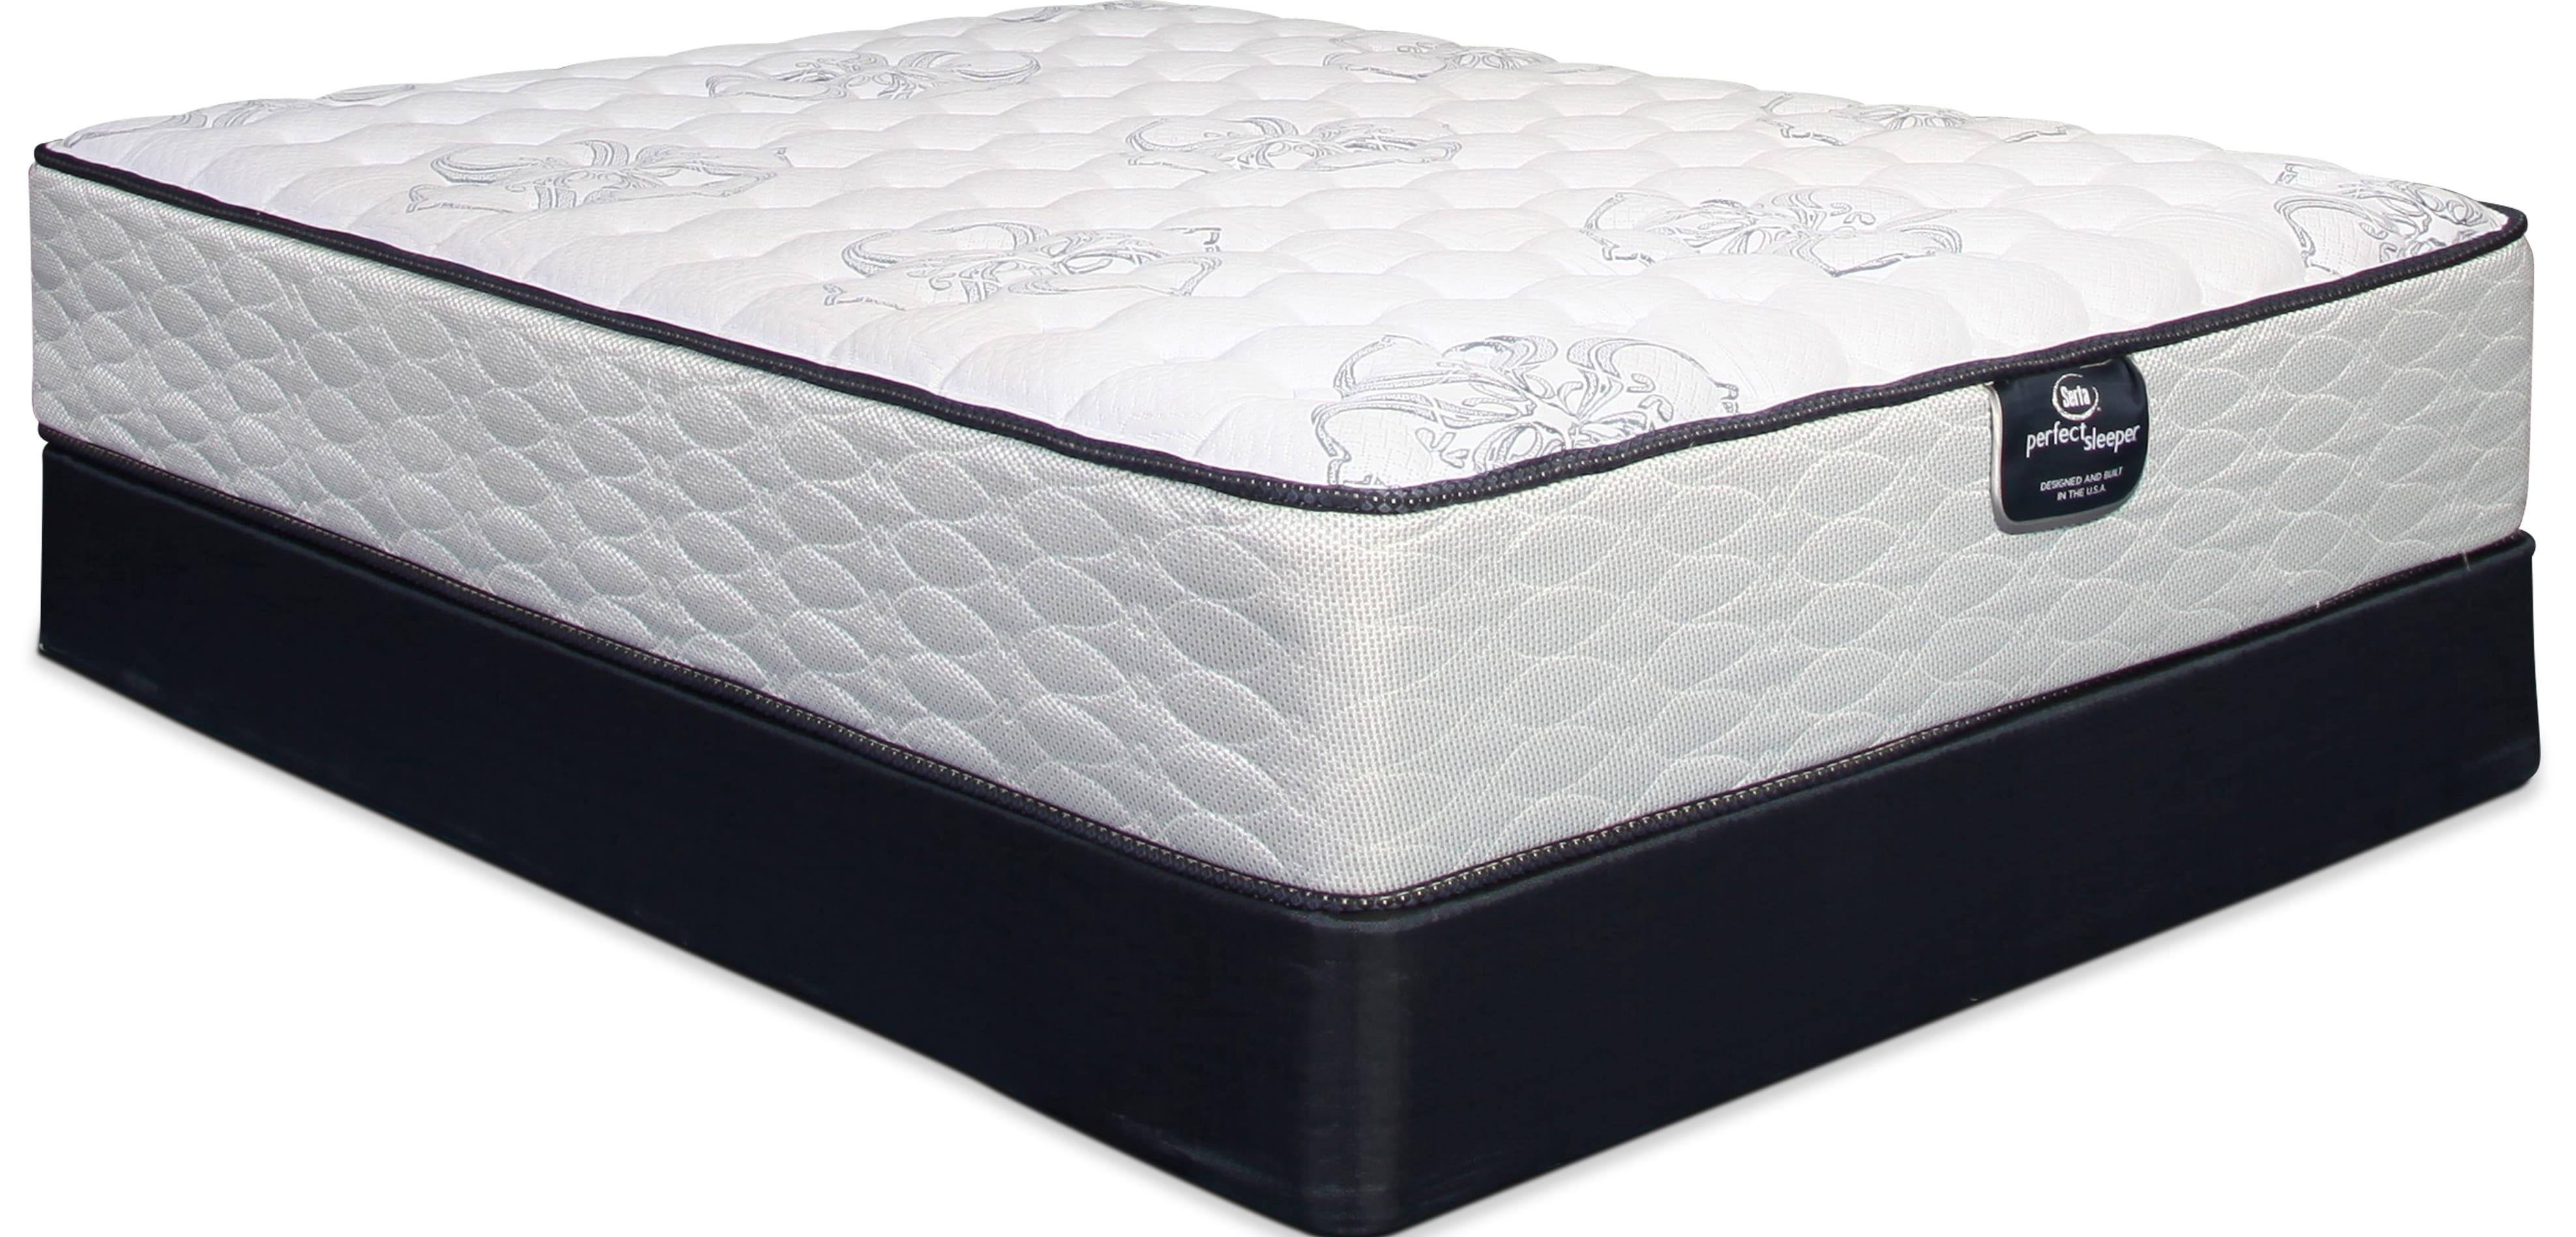 Serta Perfect Sleeper Ultra Firm Full Mattress and Boxspring